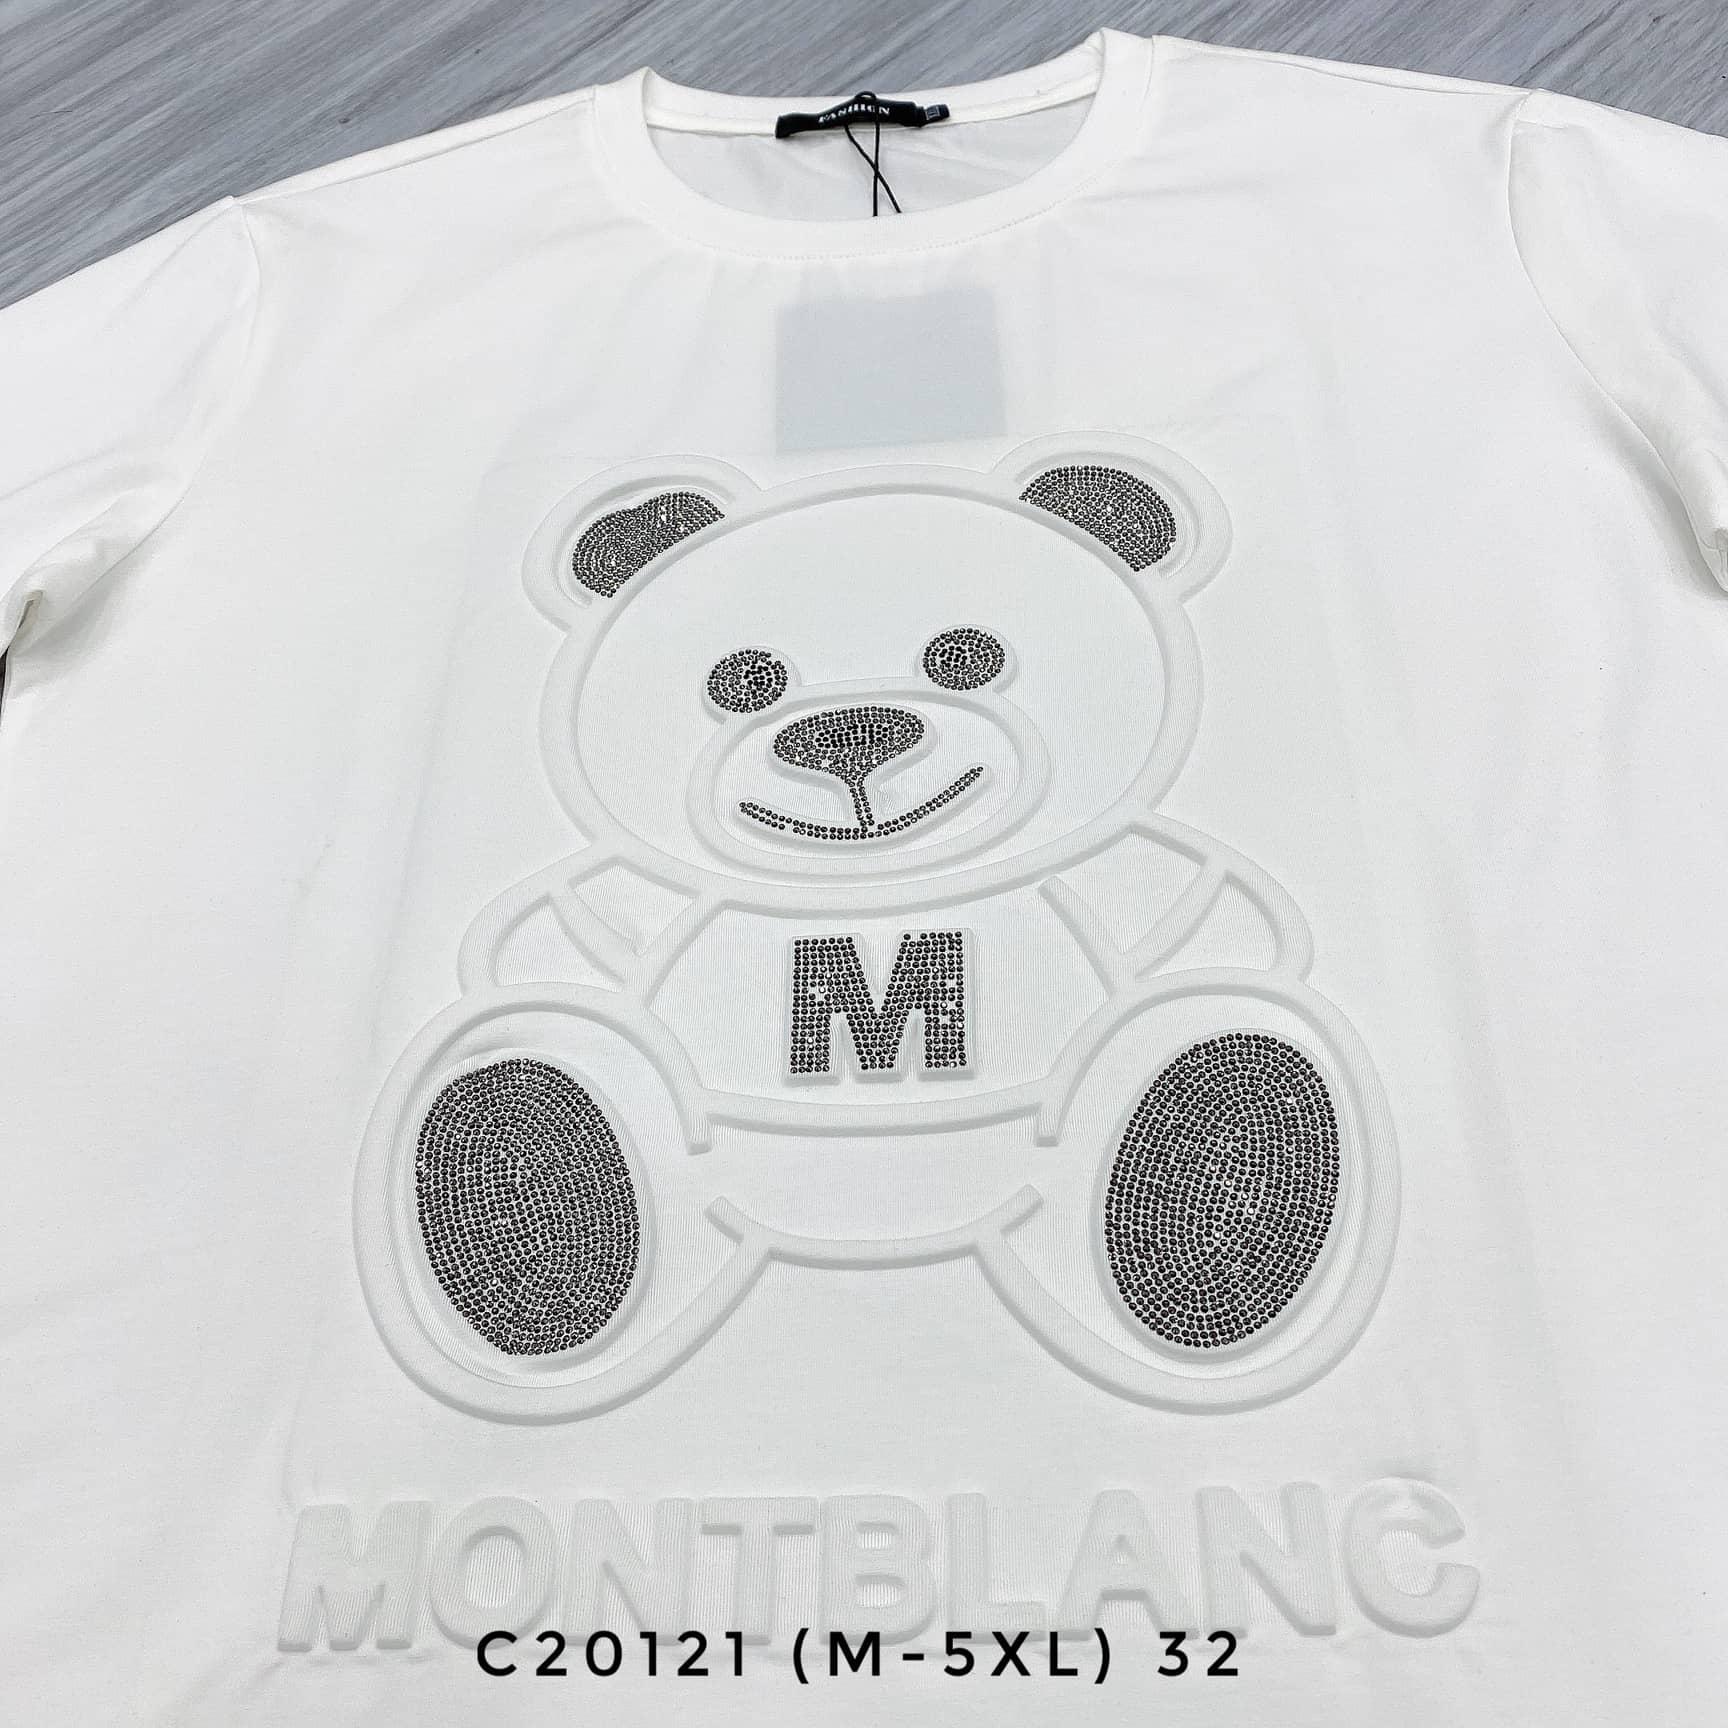 AT CỔ TRÒN C20121 (M-5XL)